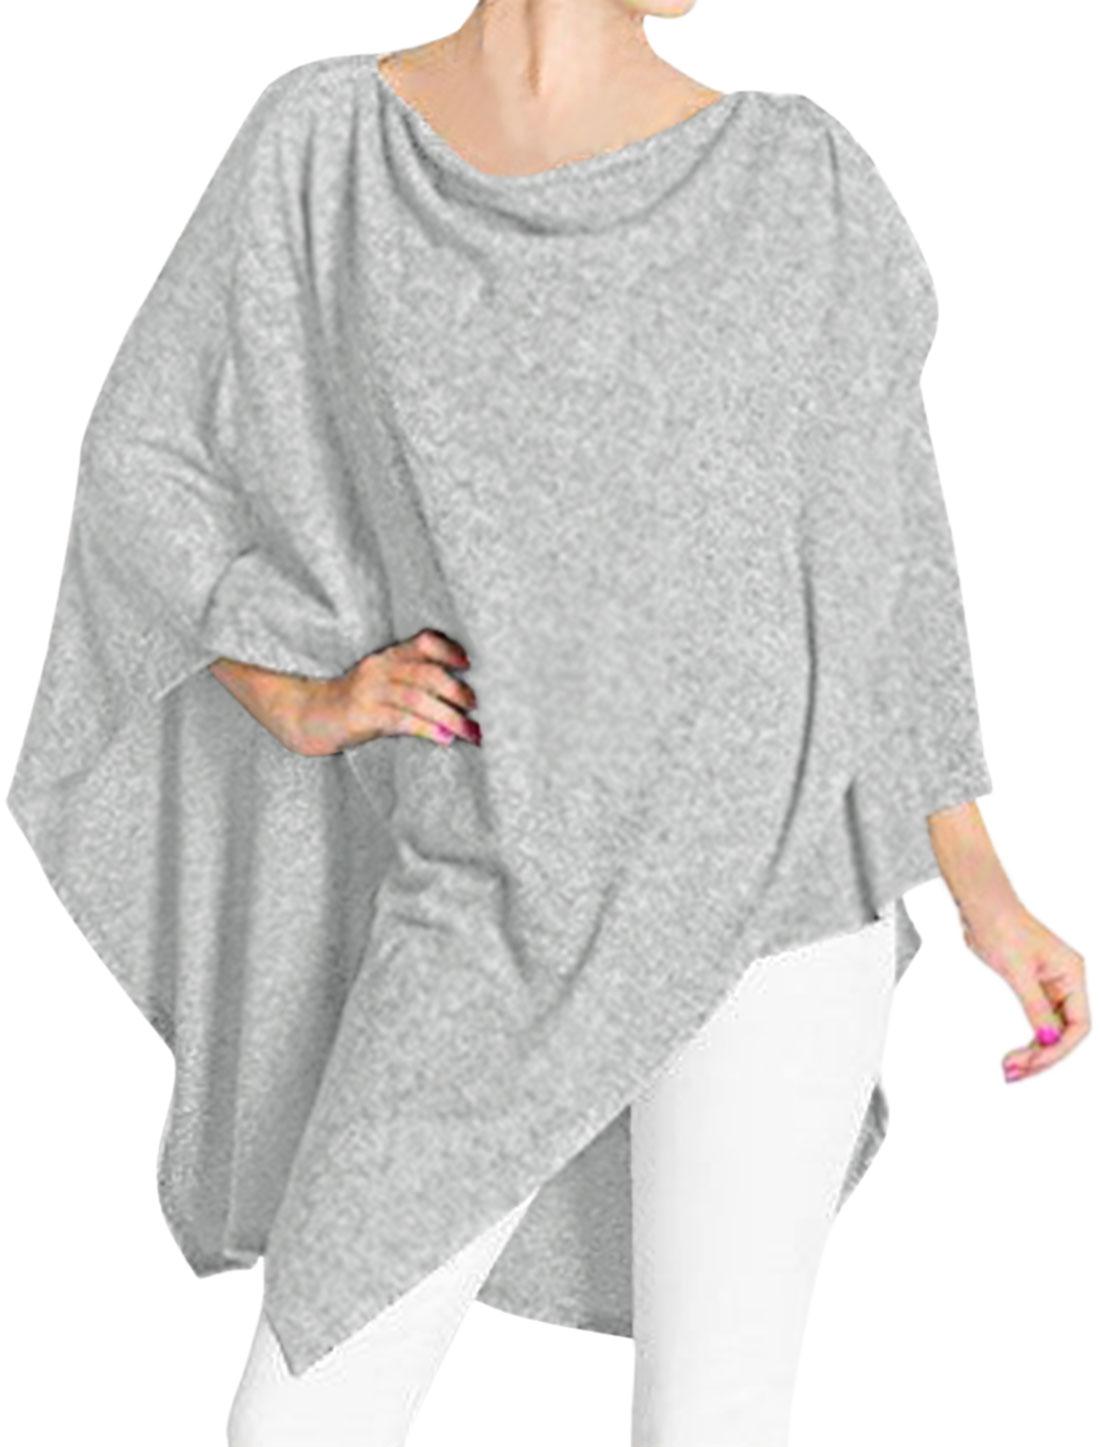 Women One Long Sleeves Asymmetric Hem Overlay Tunic Poncho Top Gray XS